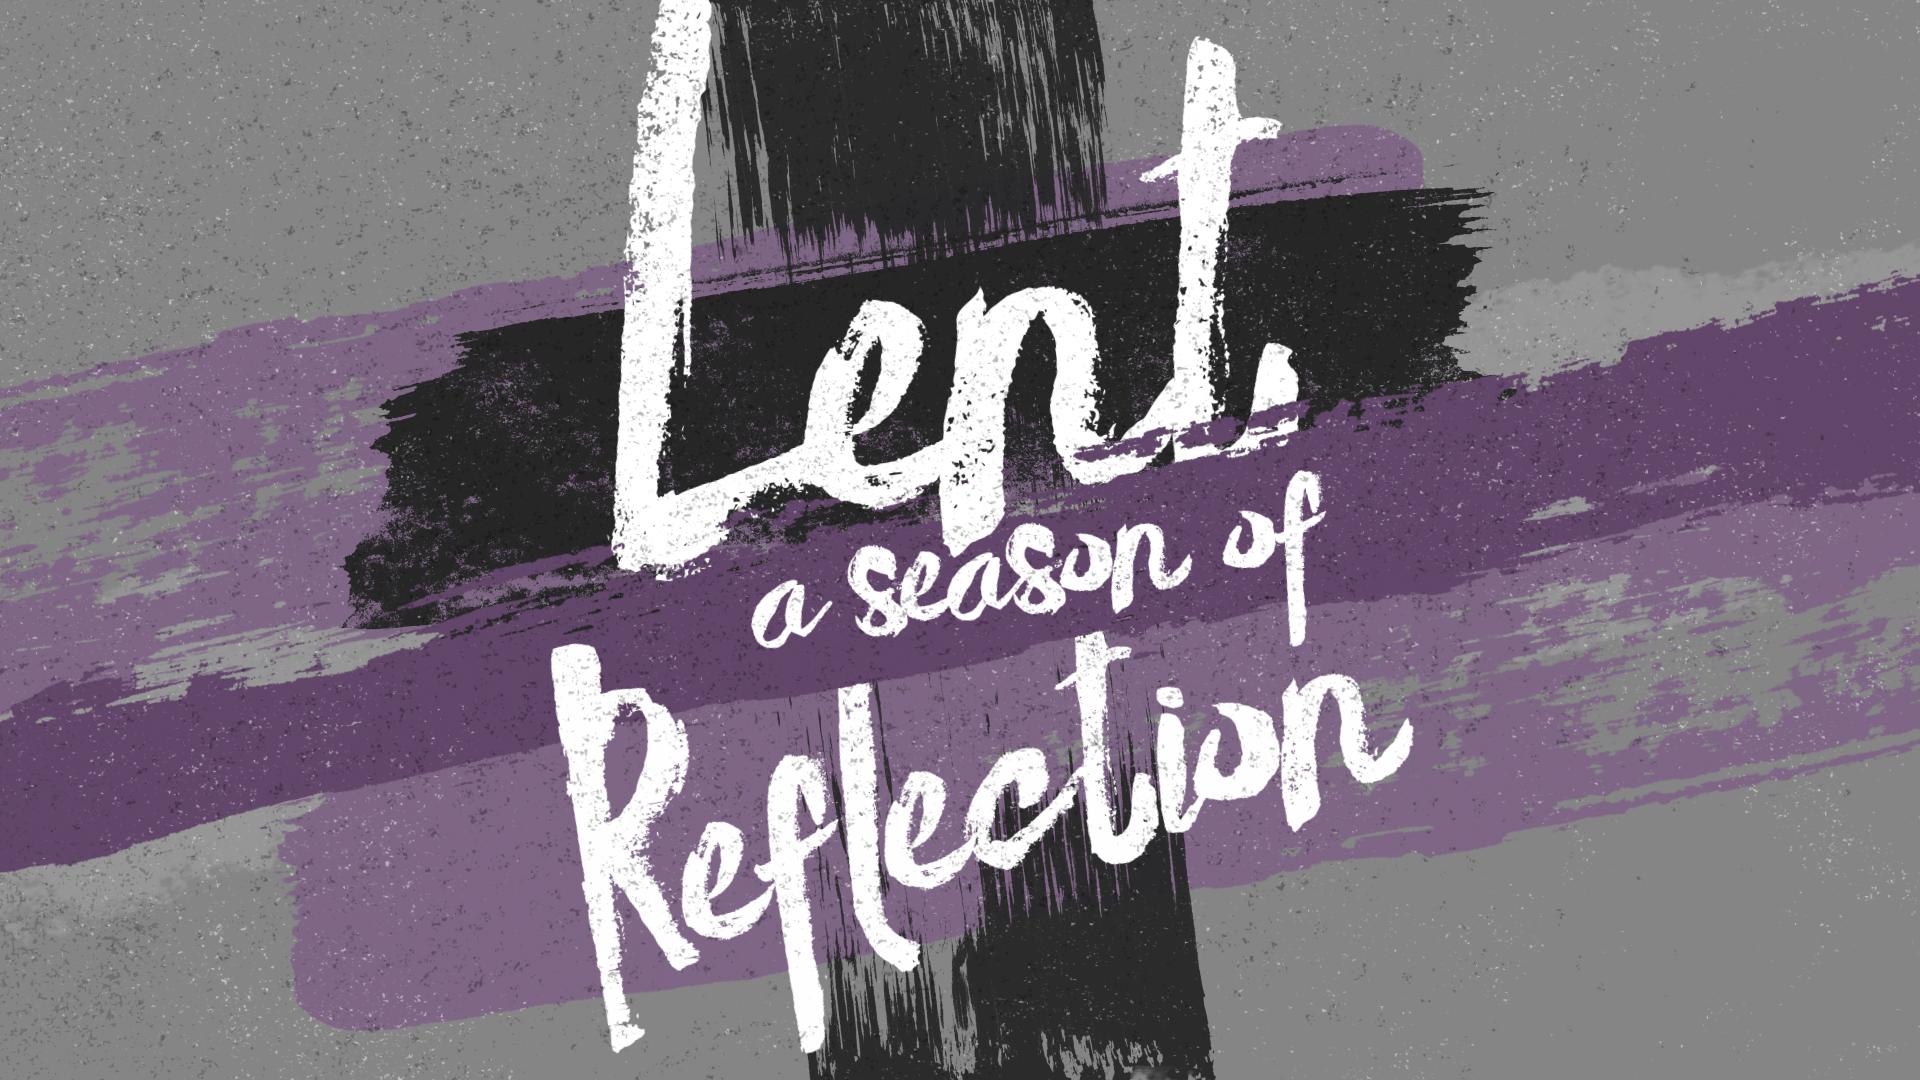 Videos for Lent